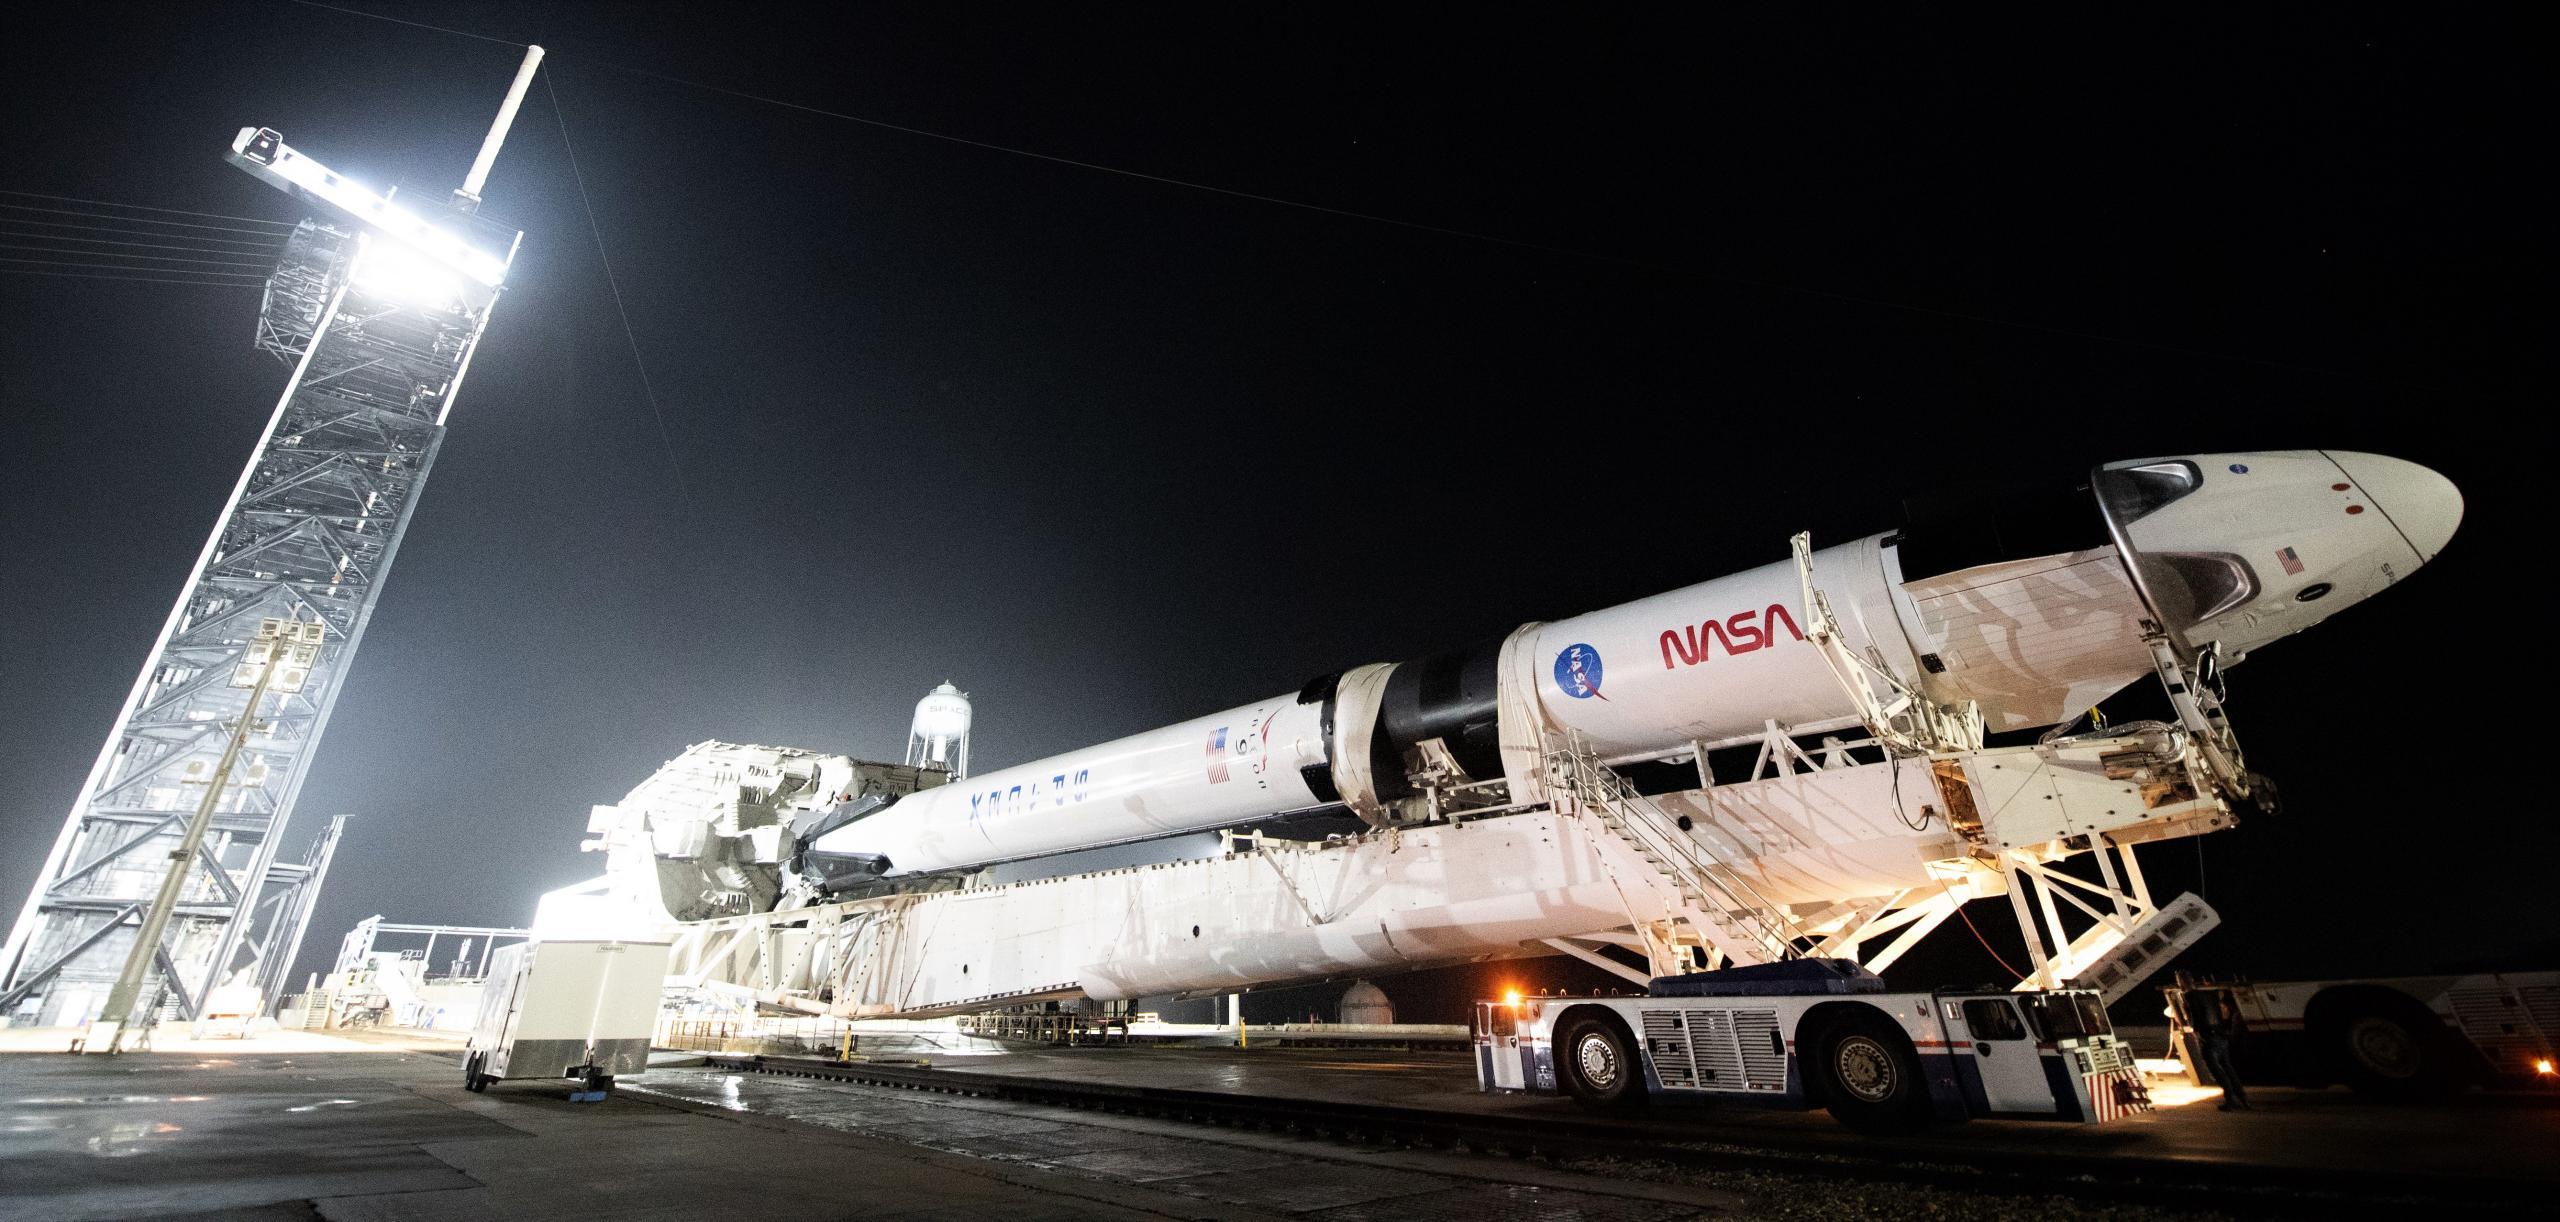 Crew-1 Crew Dragon C207 Falcon 9 B1061 39A 110820 (NASA) rollout 10 crop (c)